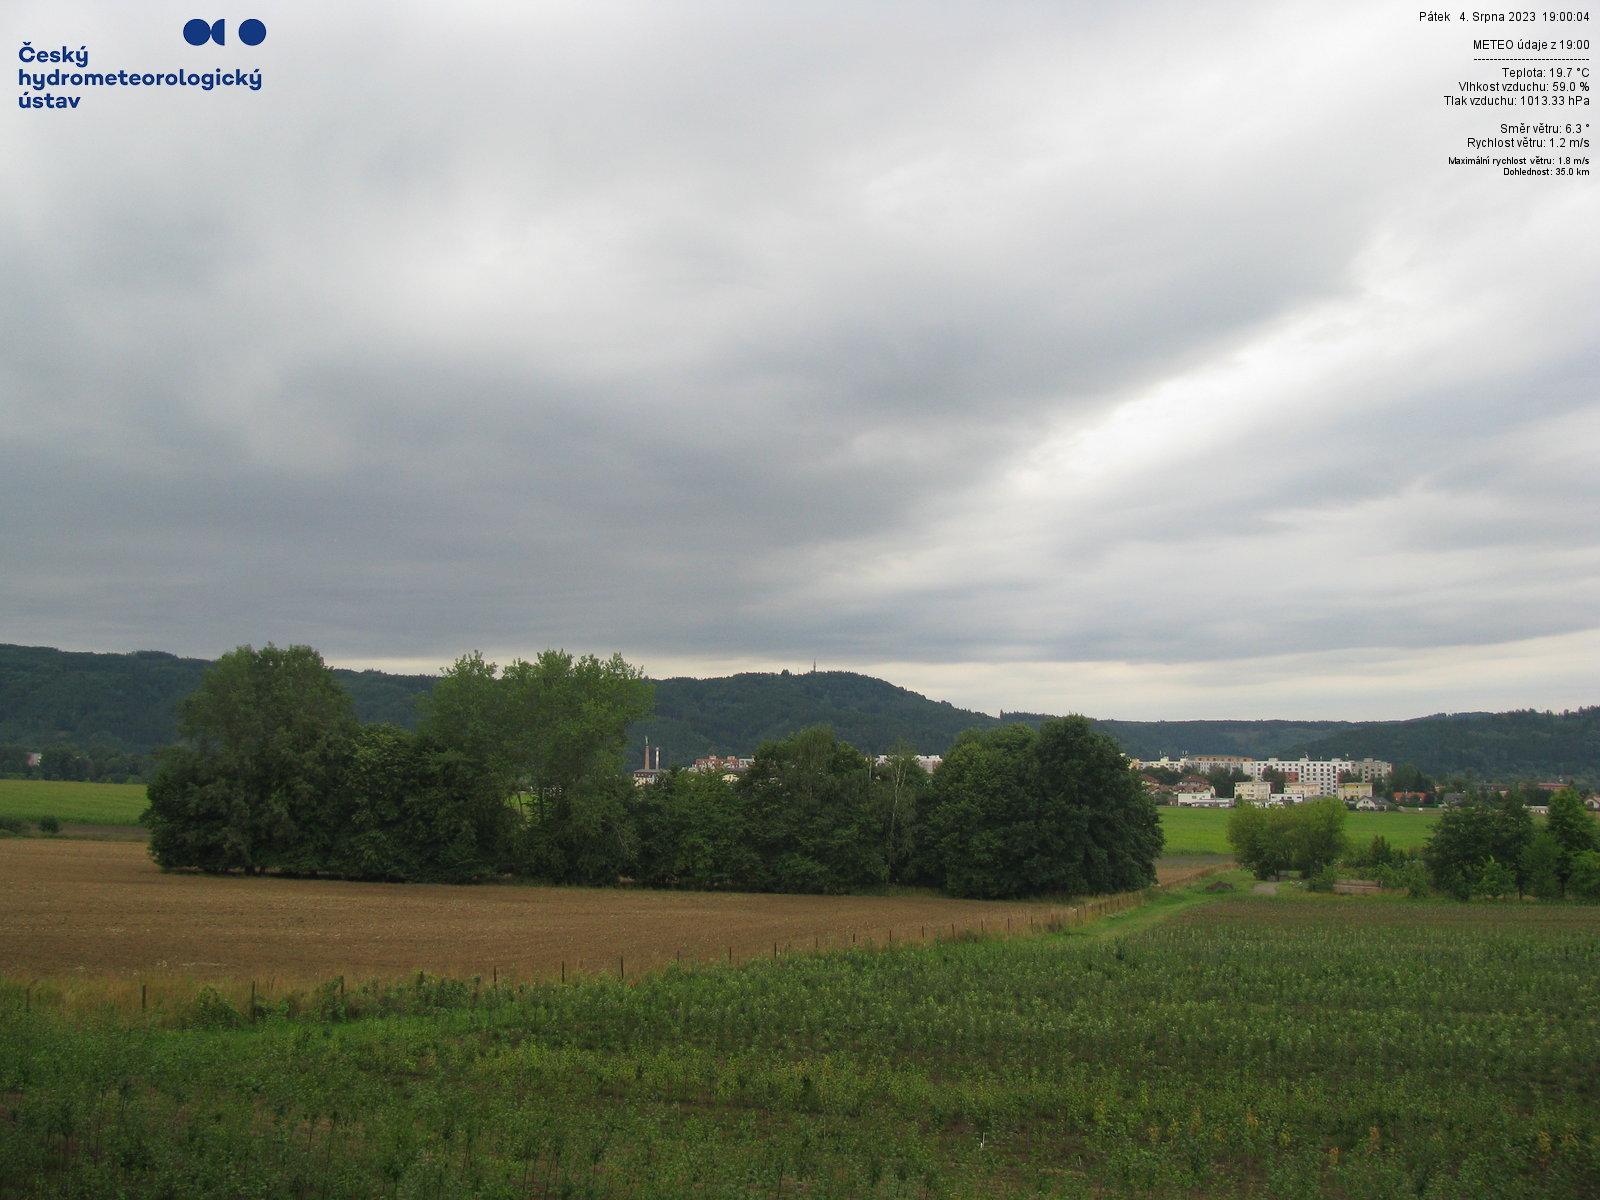 Webcam - Ústí nad Orlicí